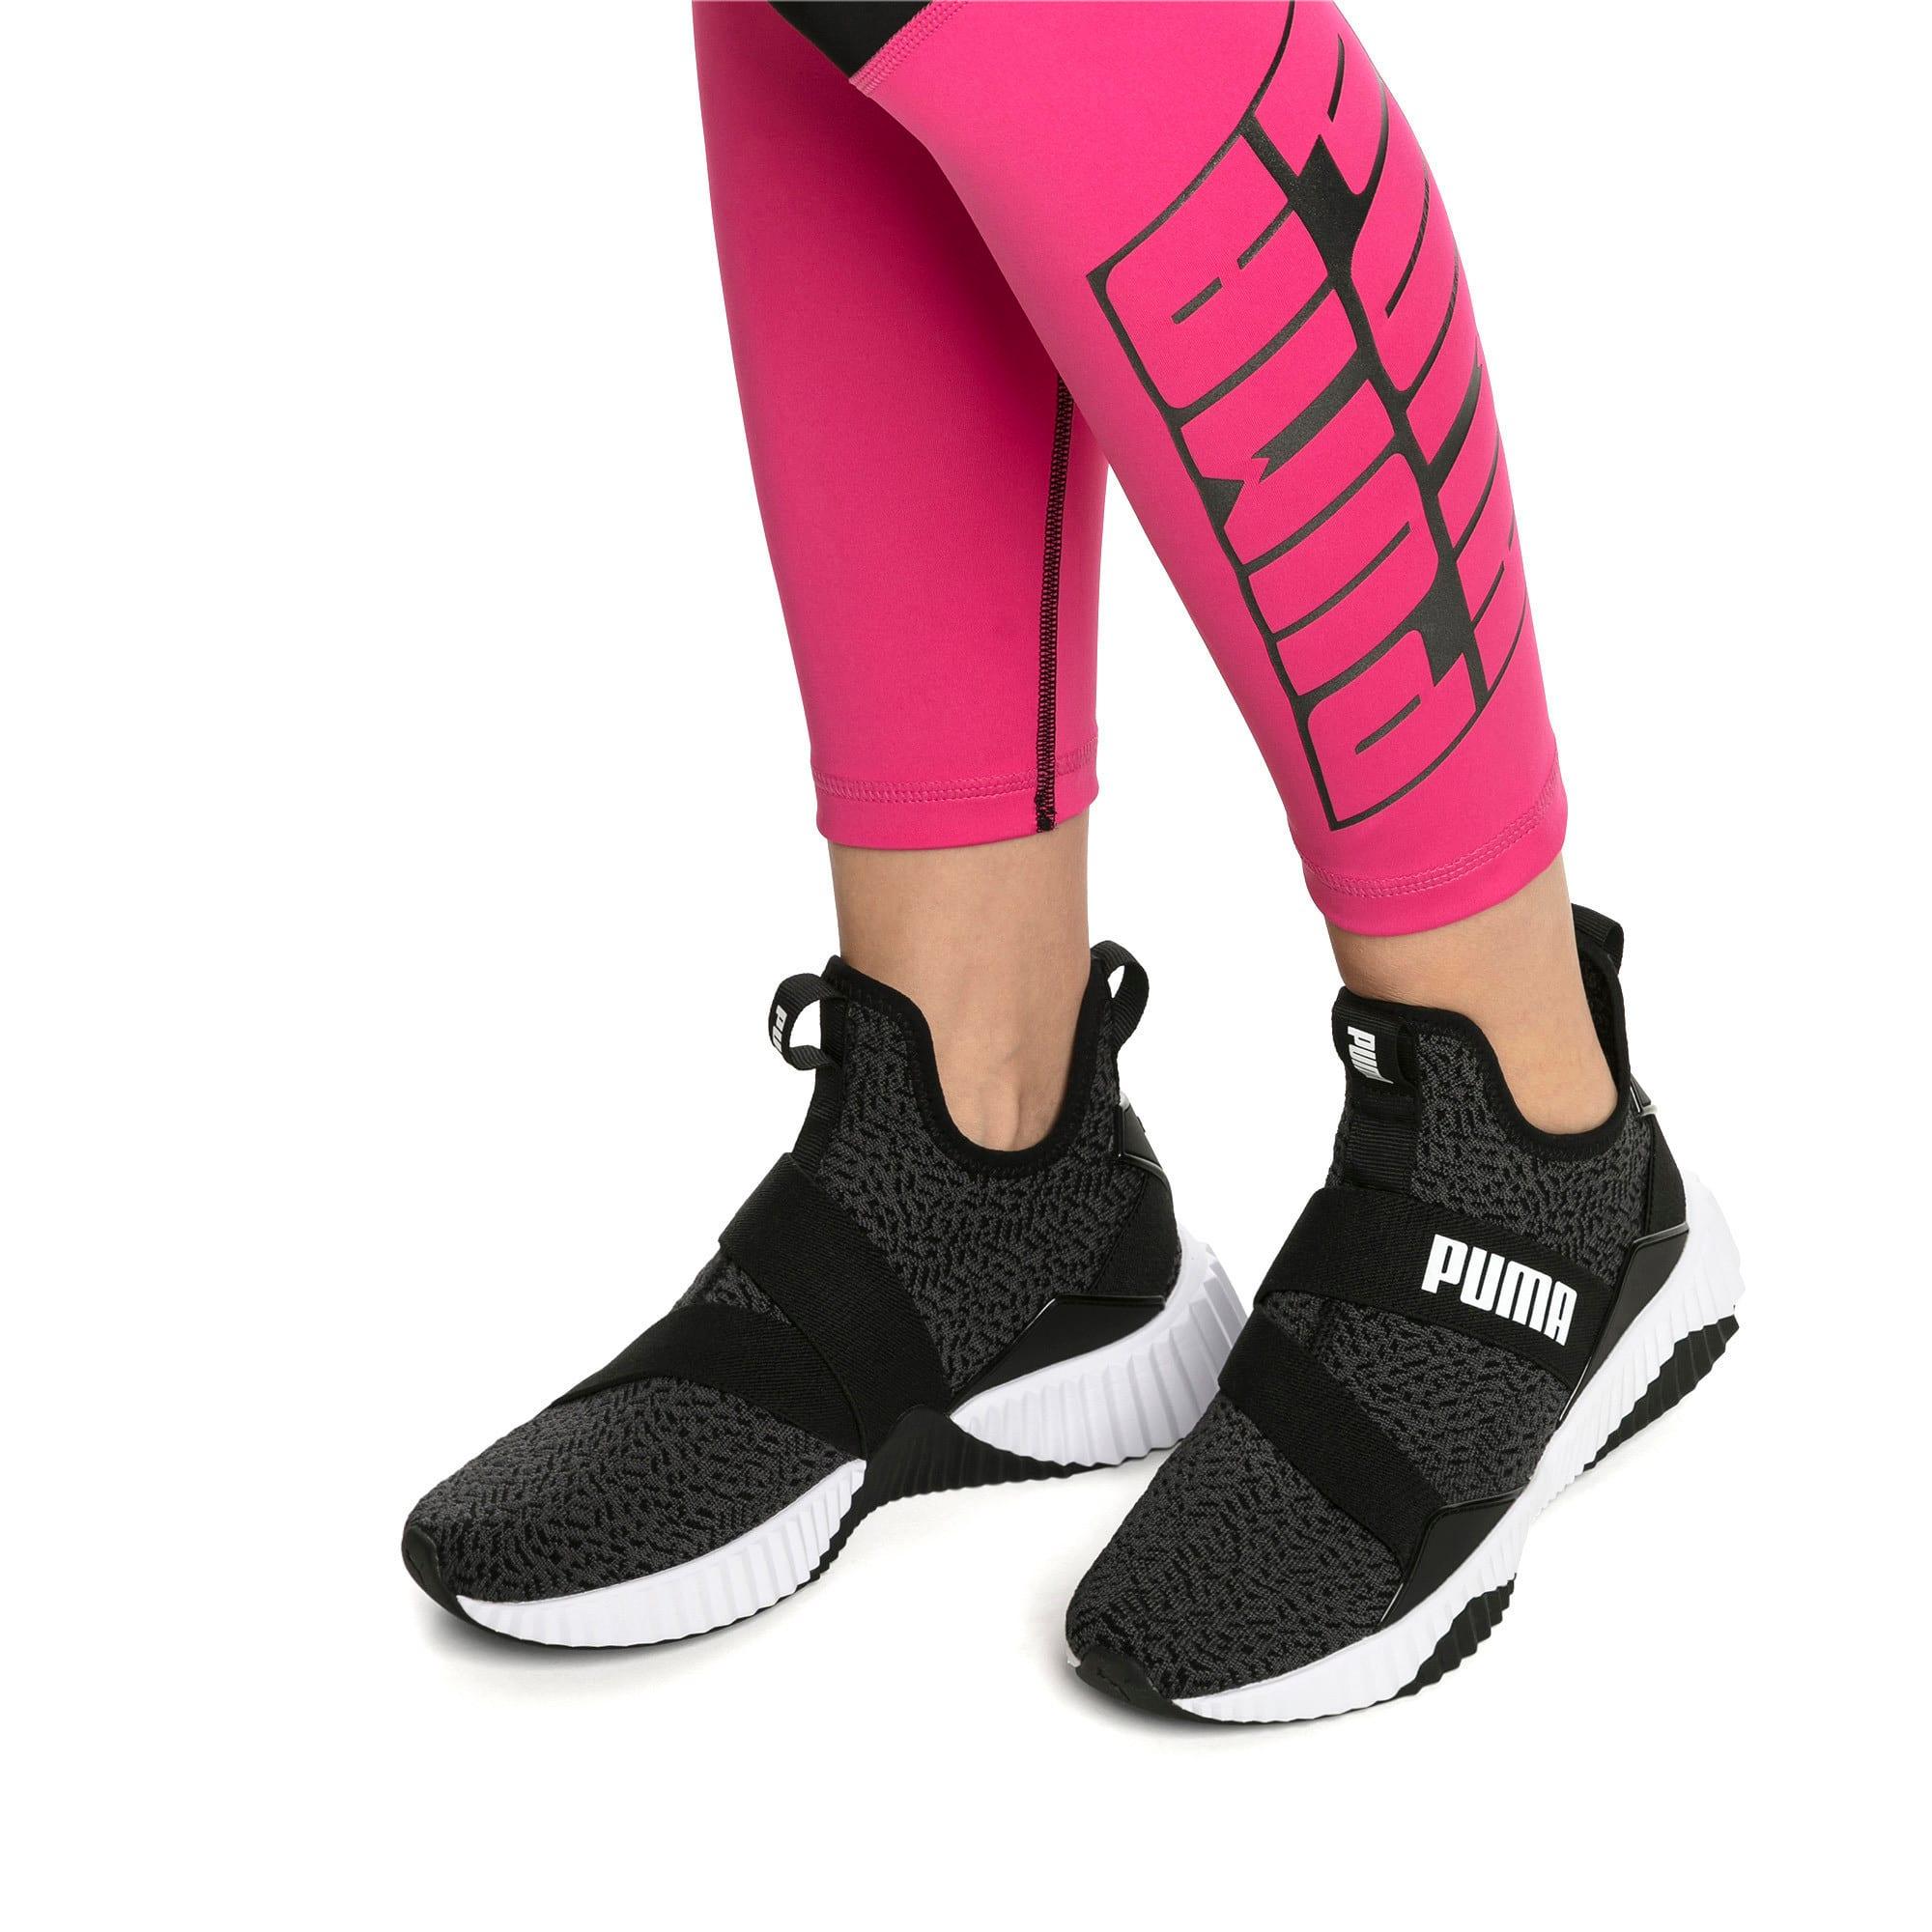 Thumbnail 8 of Defy Mid Animal Women's Training Shoes, Puma Black-Puma White, medium-IND